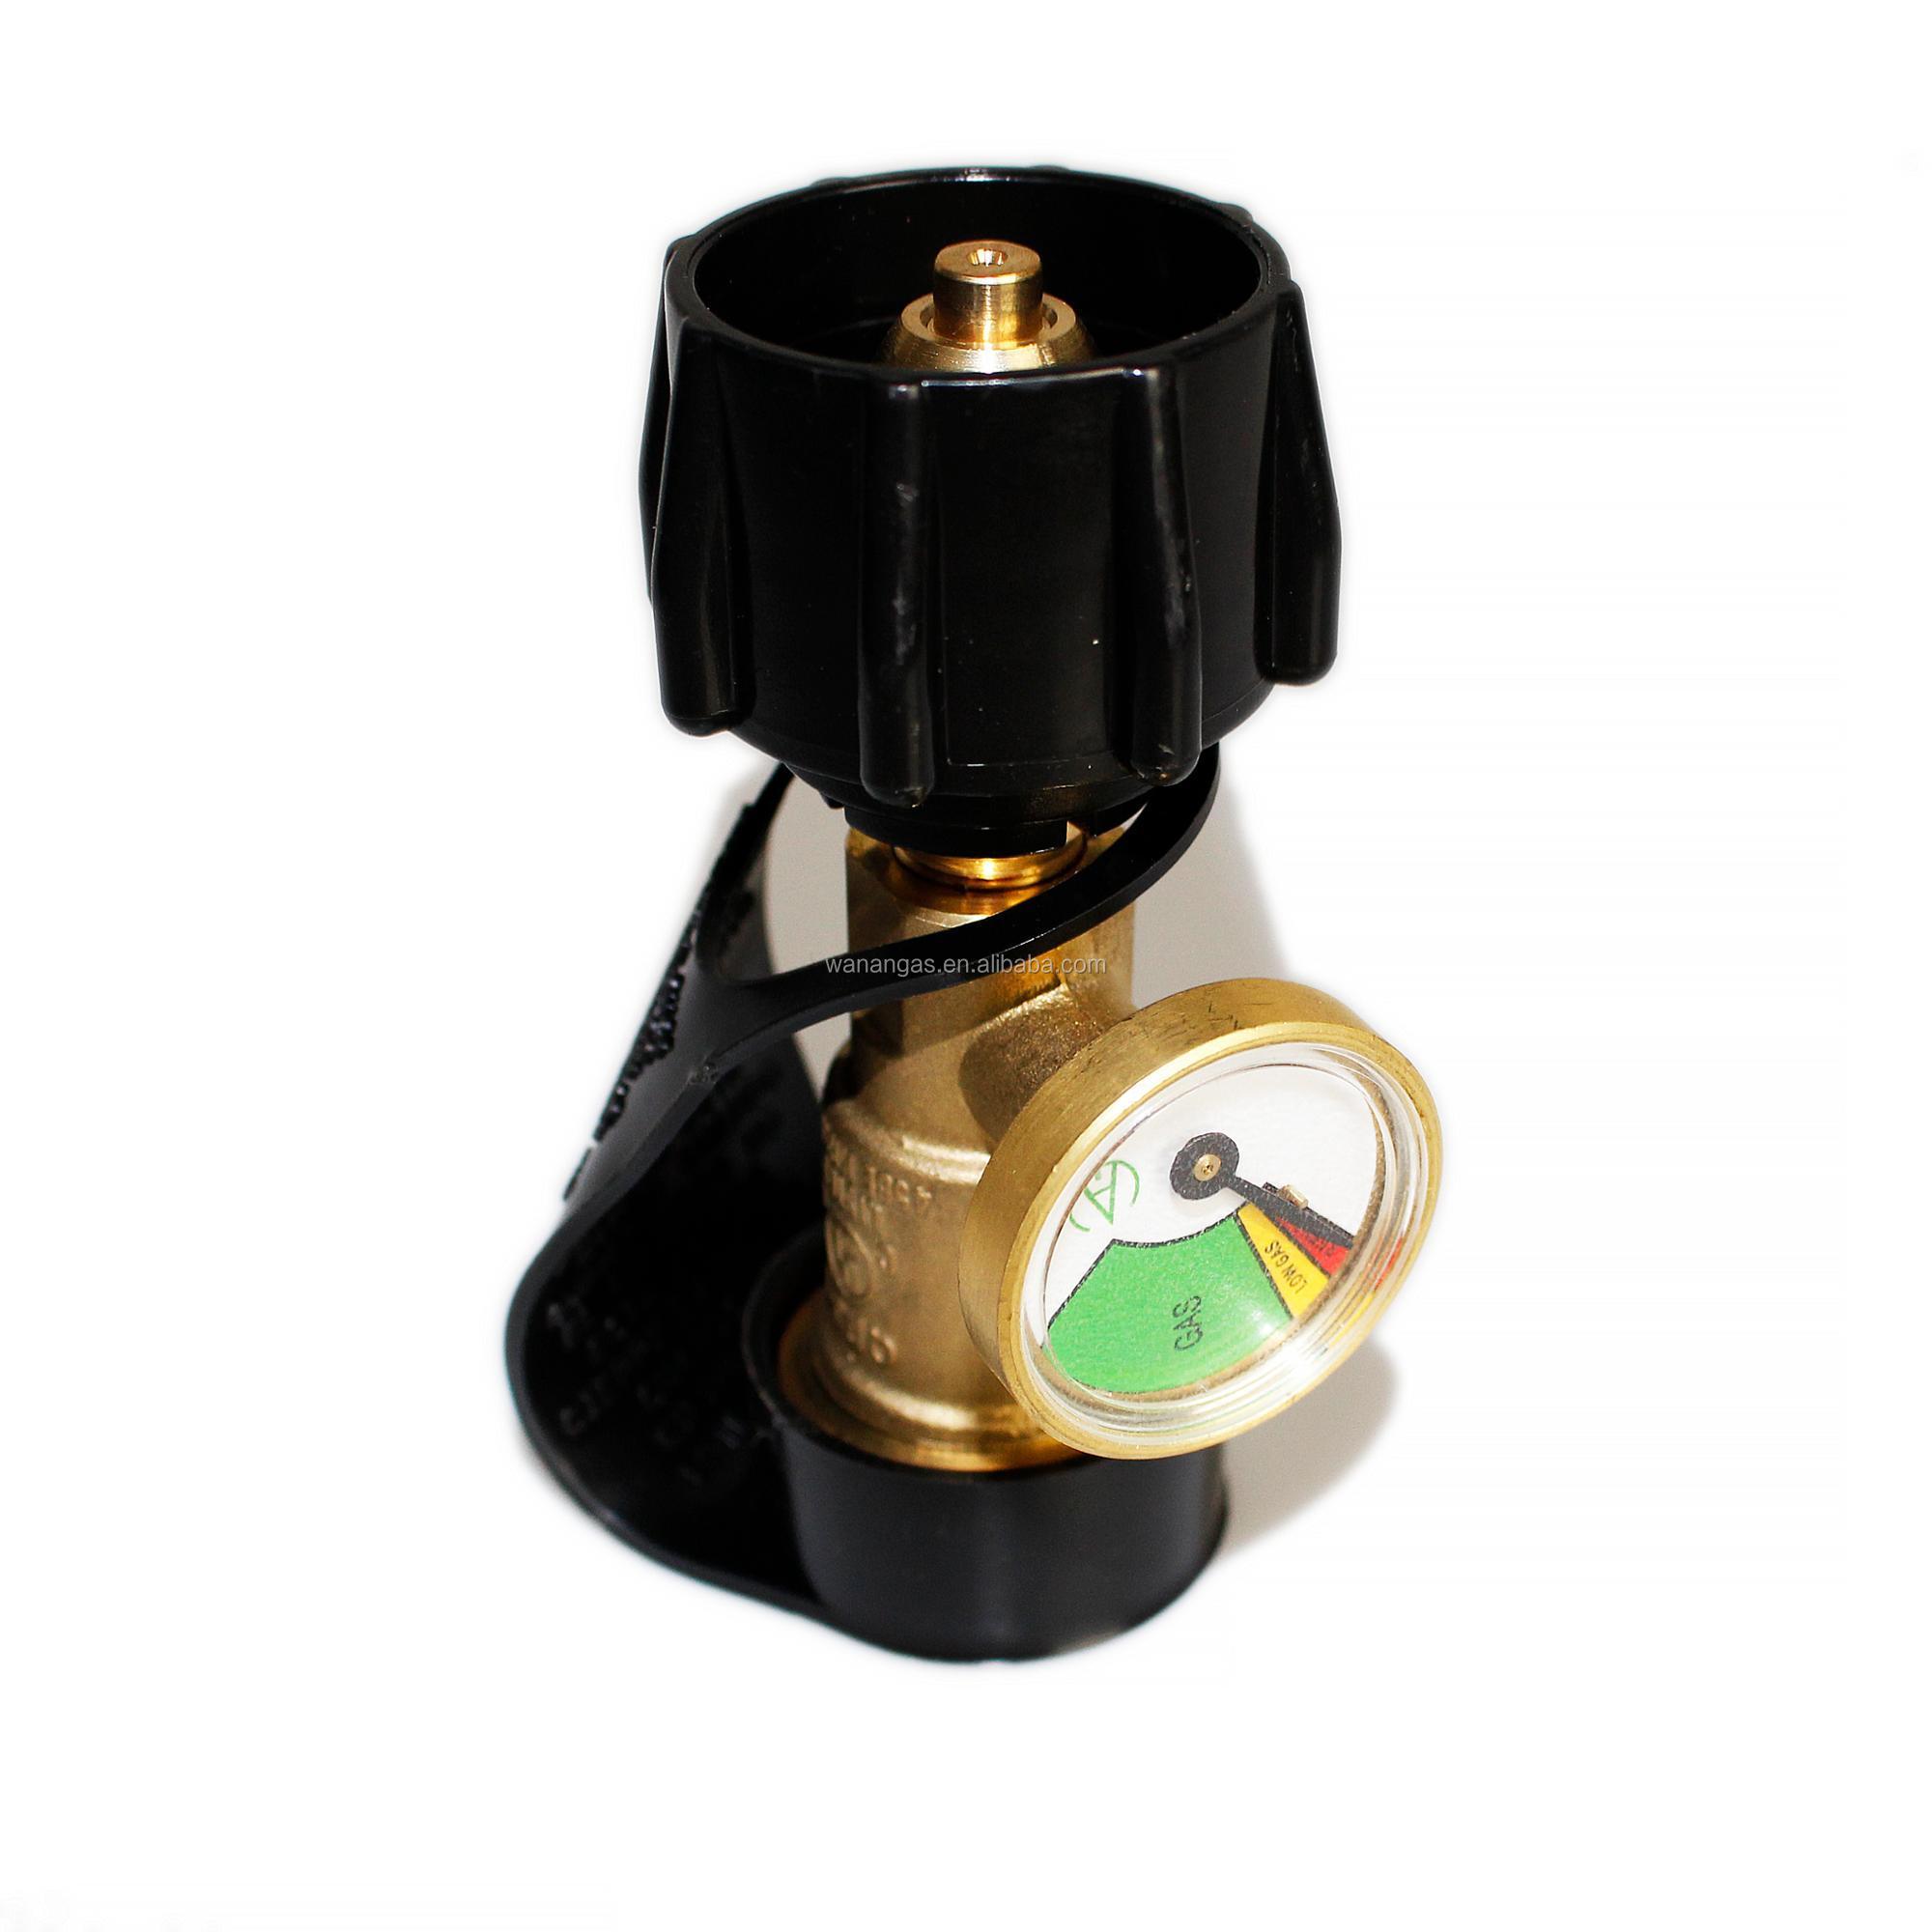 Csa Zulassung Walmart Umsatz Qpj B Propan Gas Manometer Meter